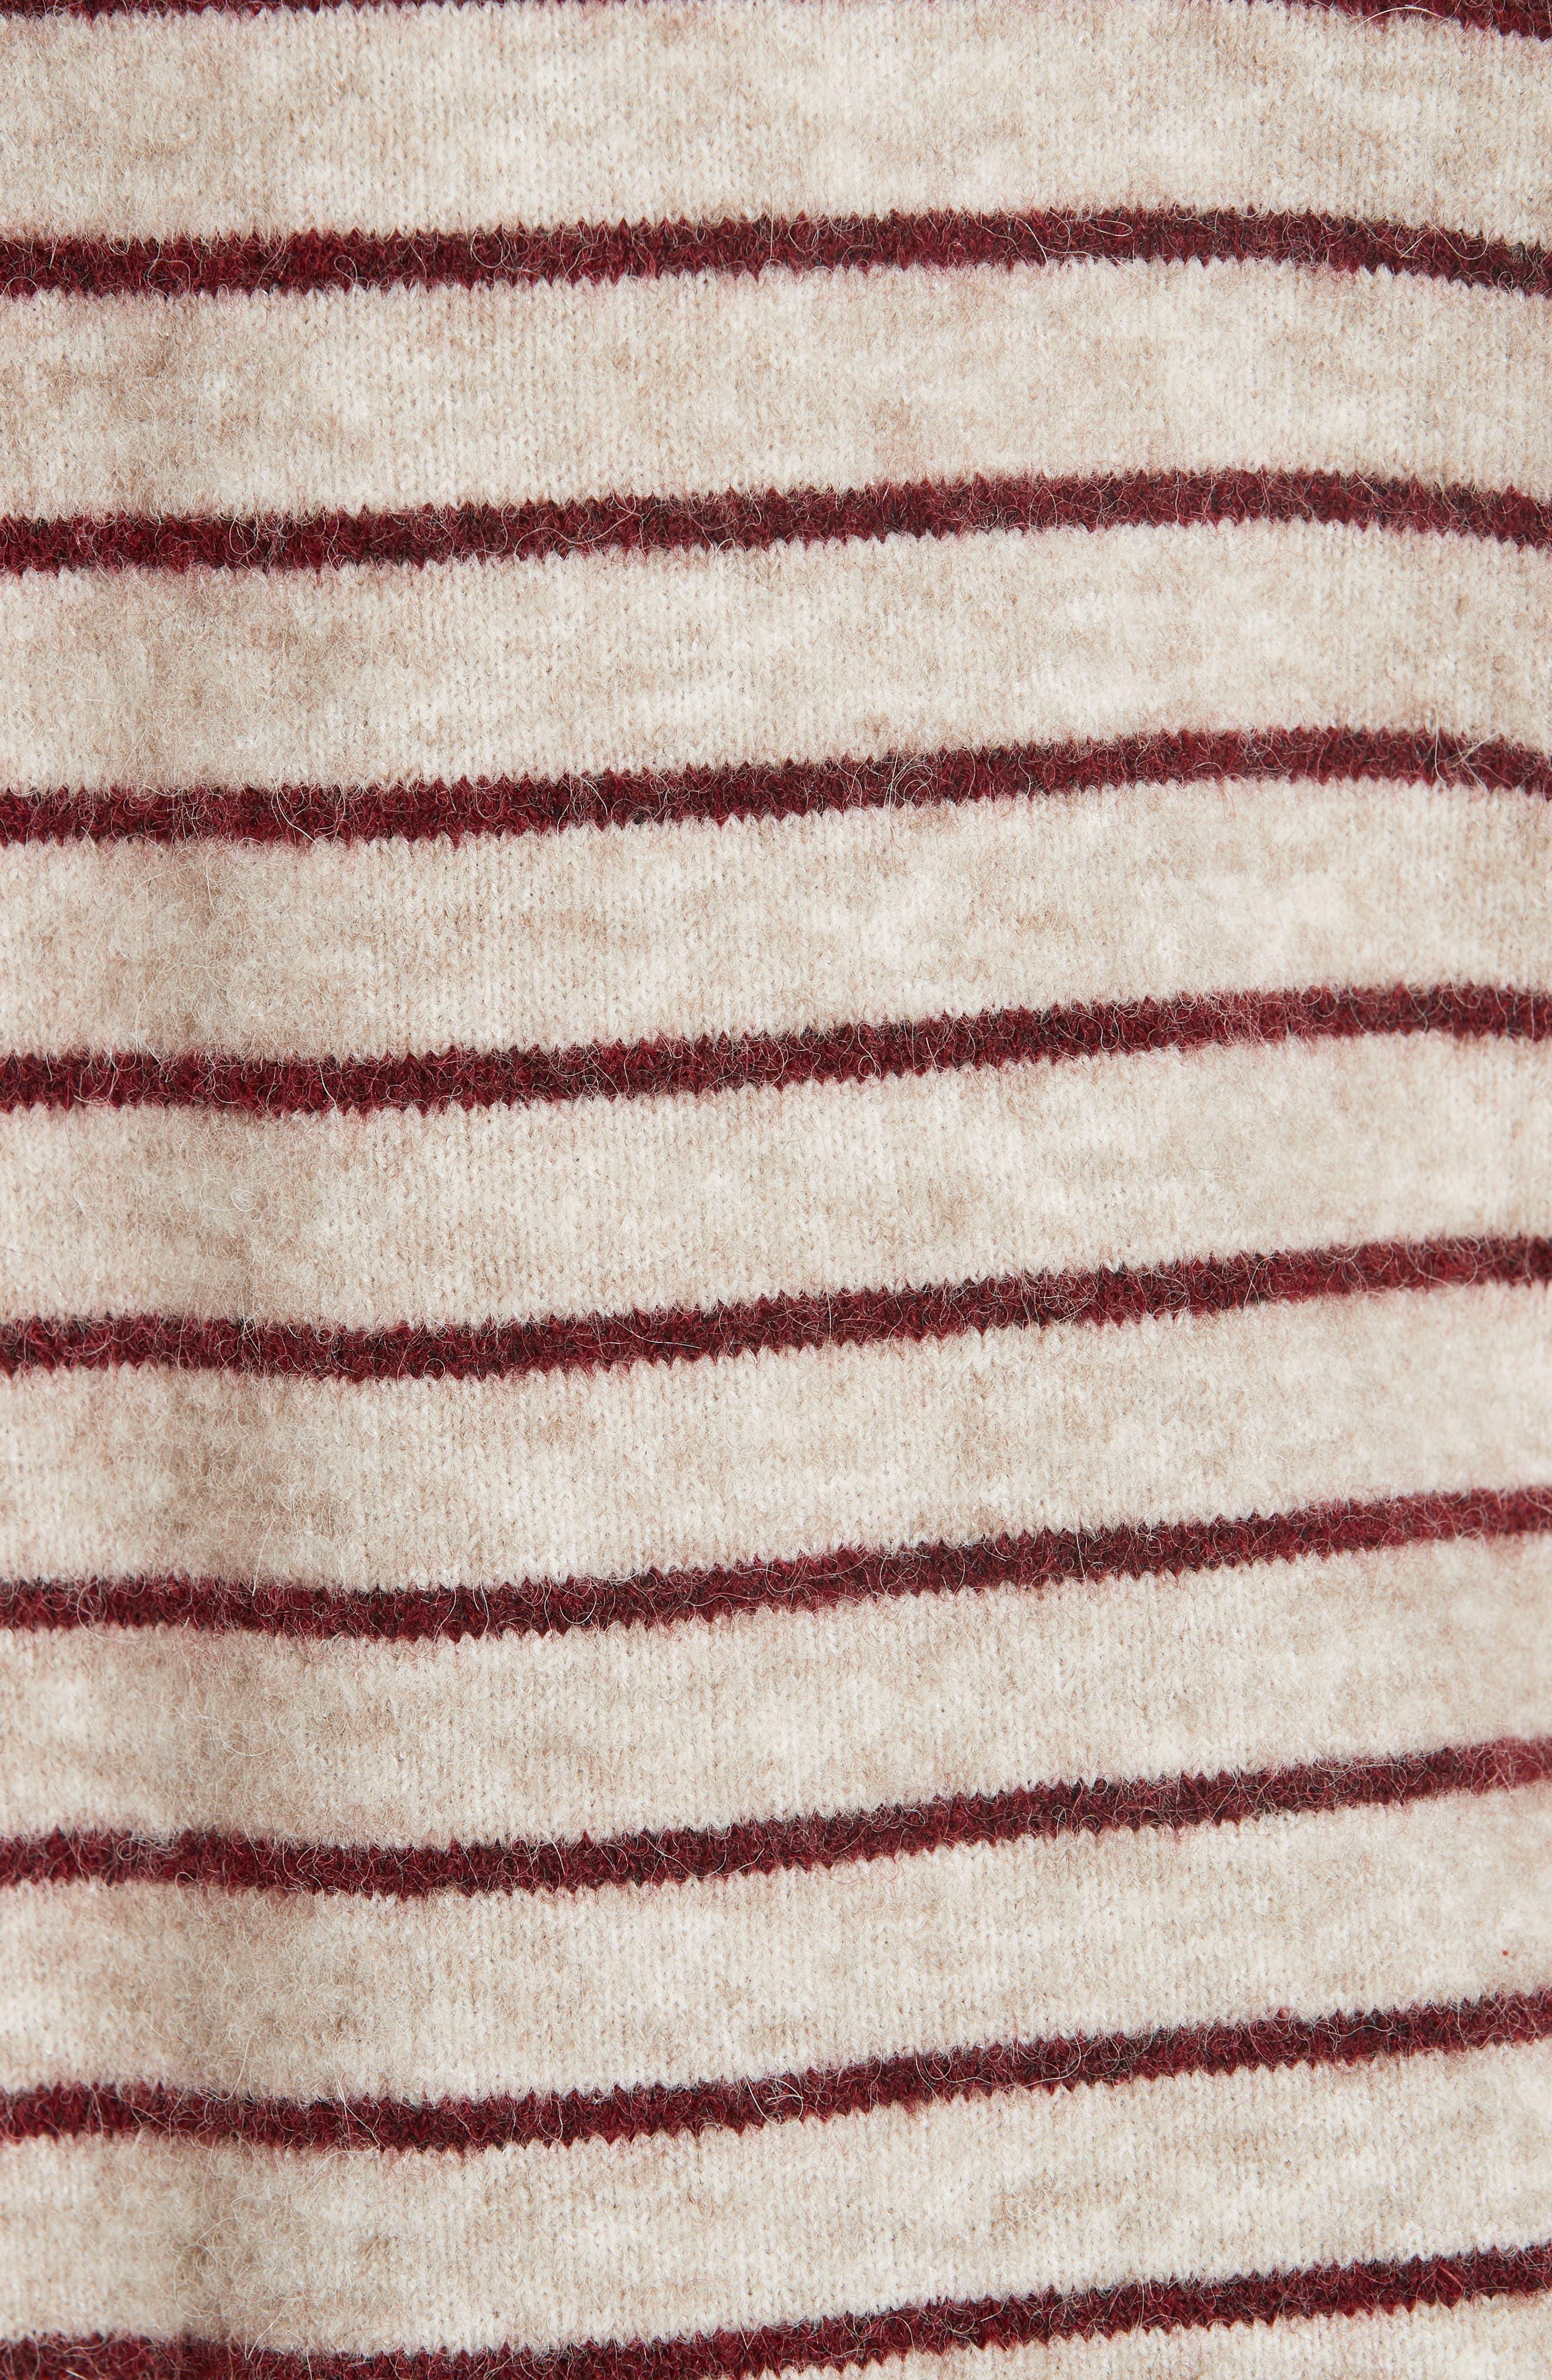 Artaud Stripe Sweater,                             Alternate thumbnail 5, color,                             BEIGE